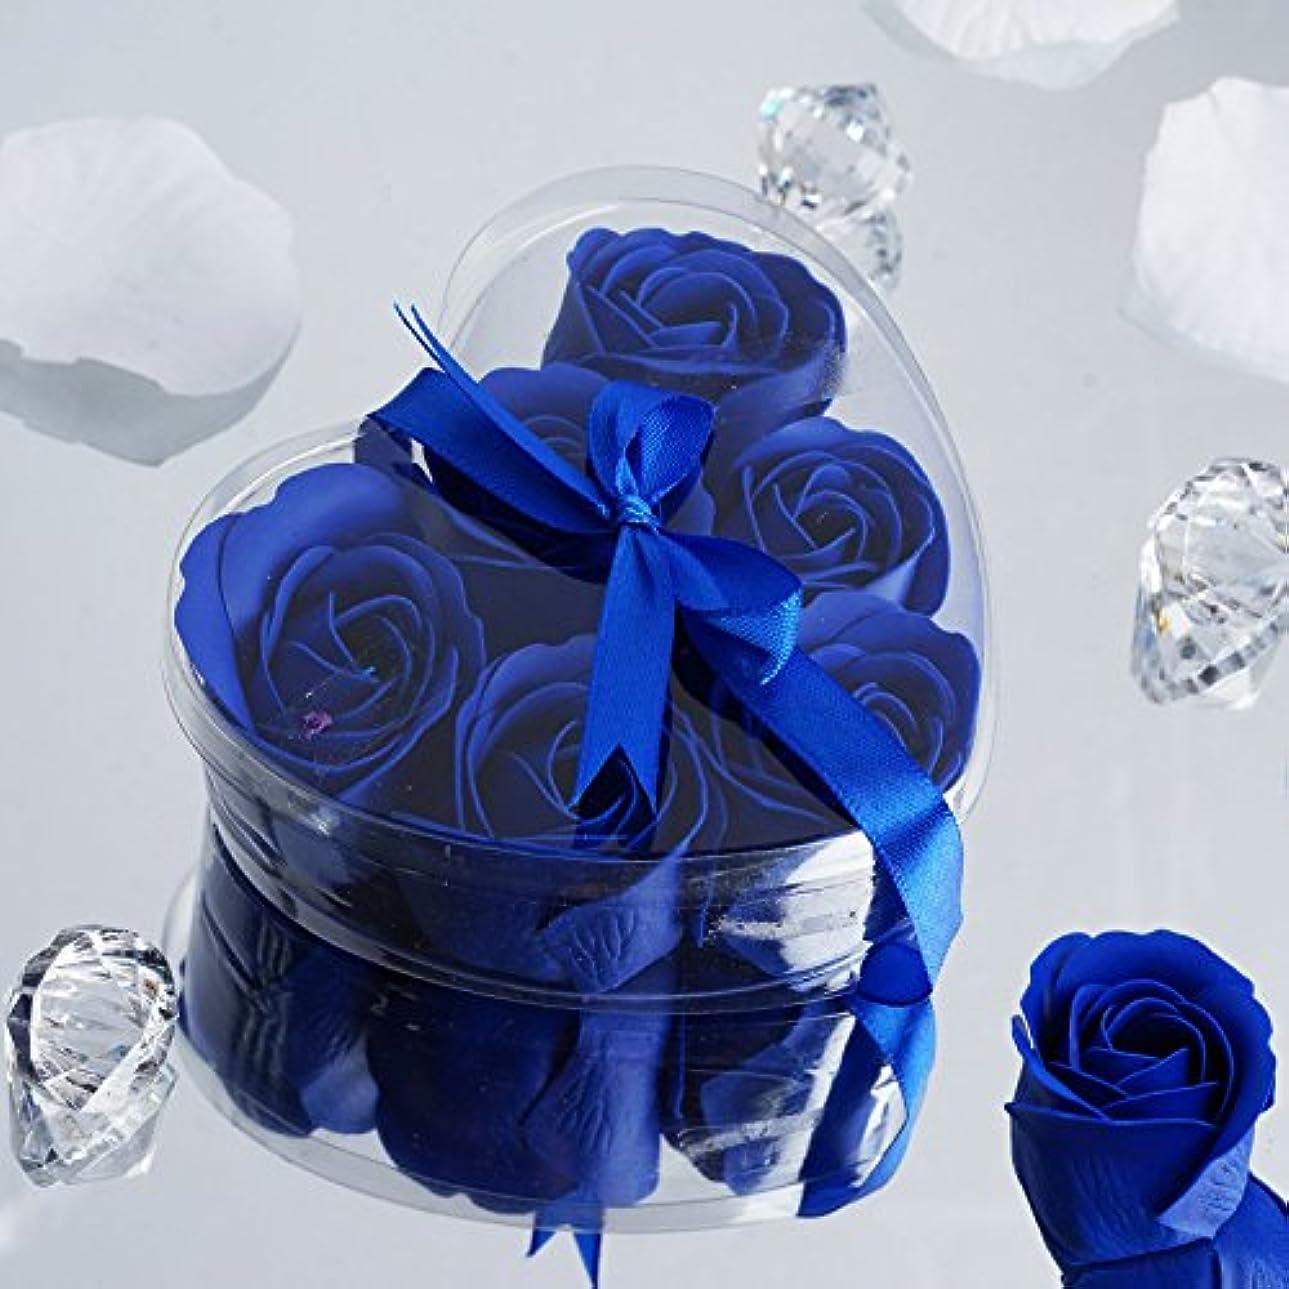 BalsaCircle 100ギフトボックス6付きローズソープ – 結婚式の贈り物 ブルー FAV_SOAP_ROY@100